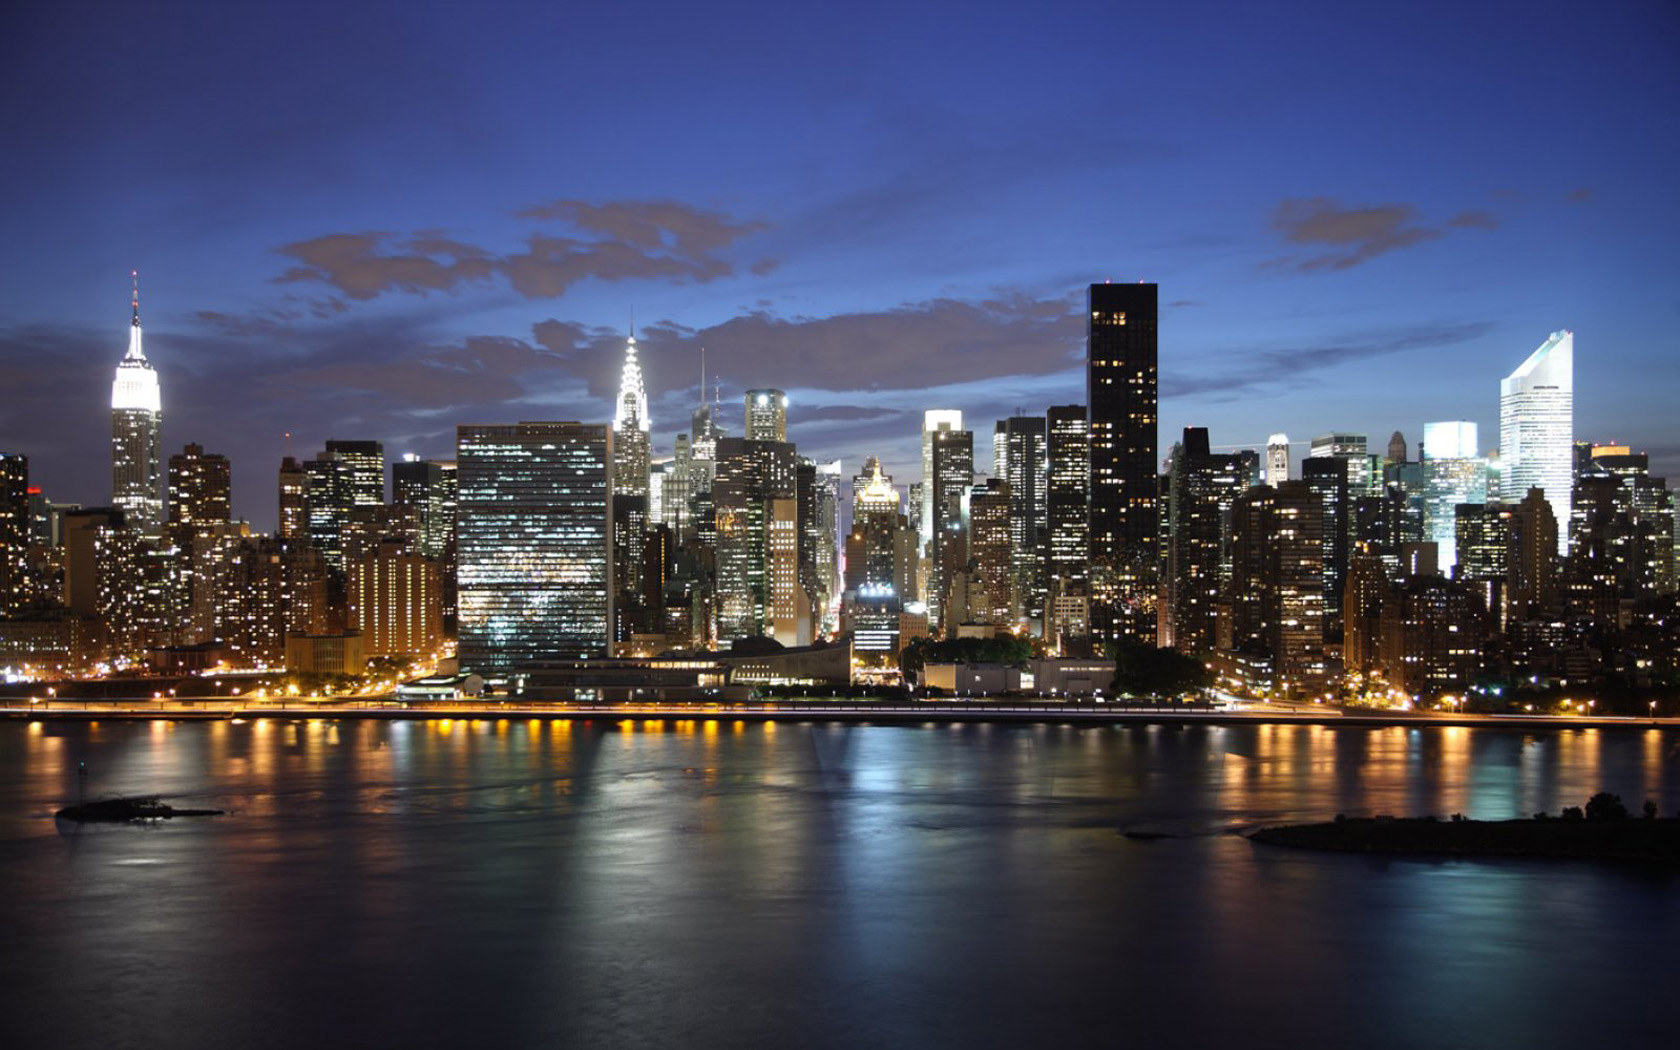 New York Skyline Hd Wallpapers New York Skyline 1680x1050